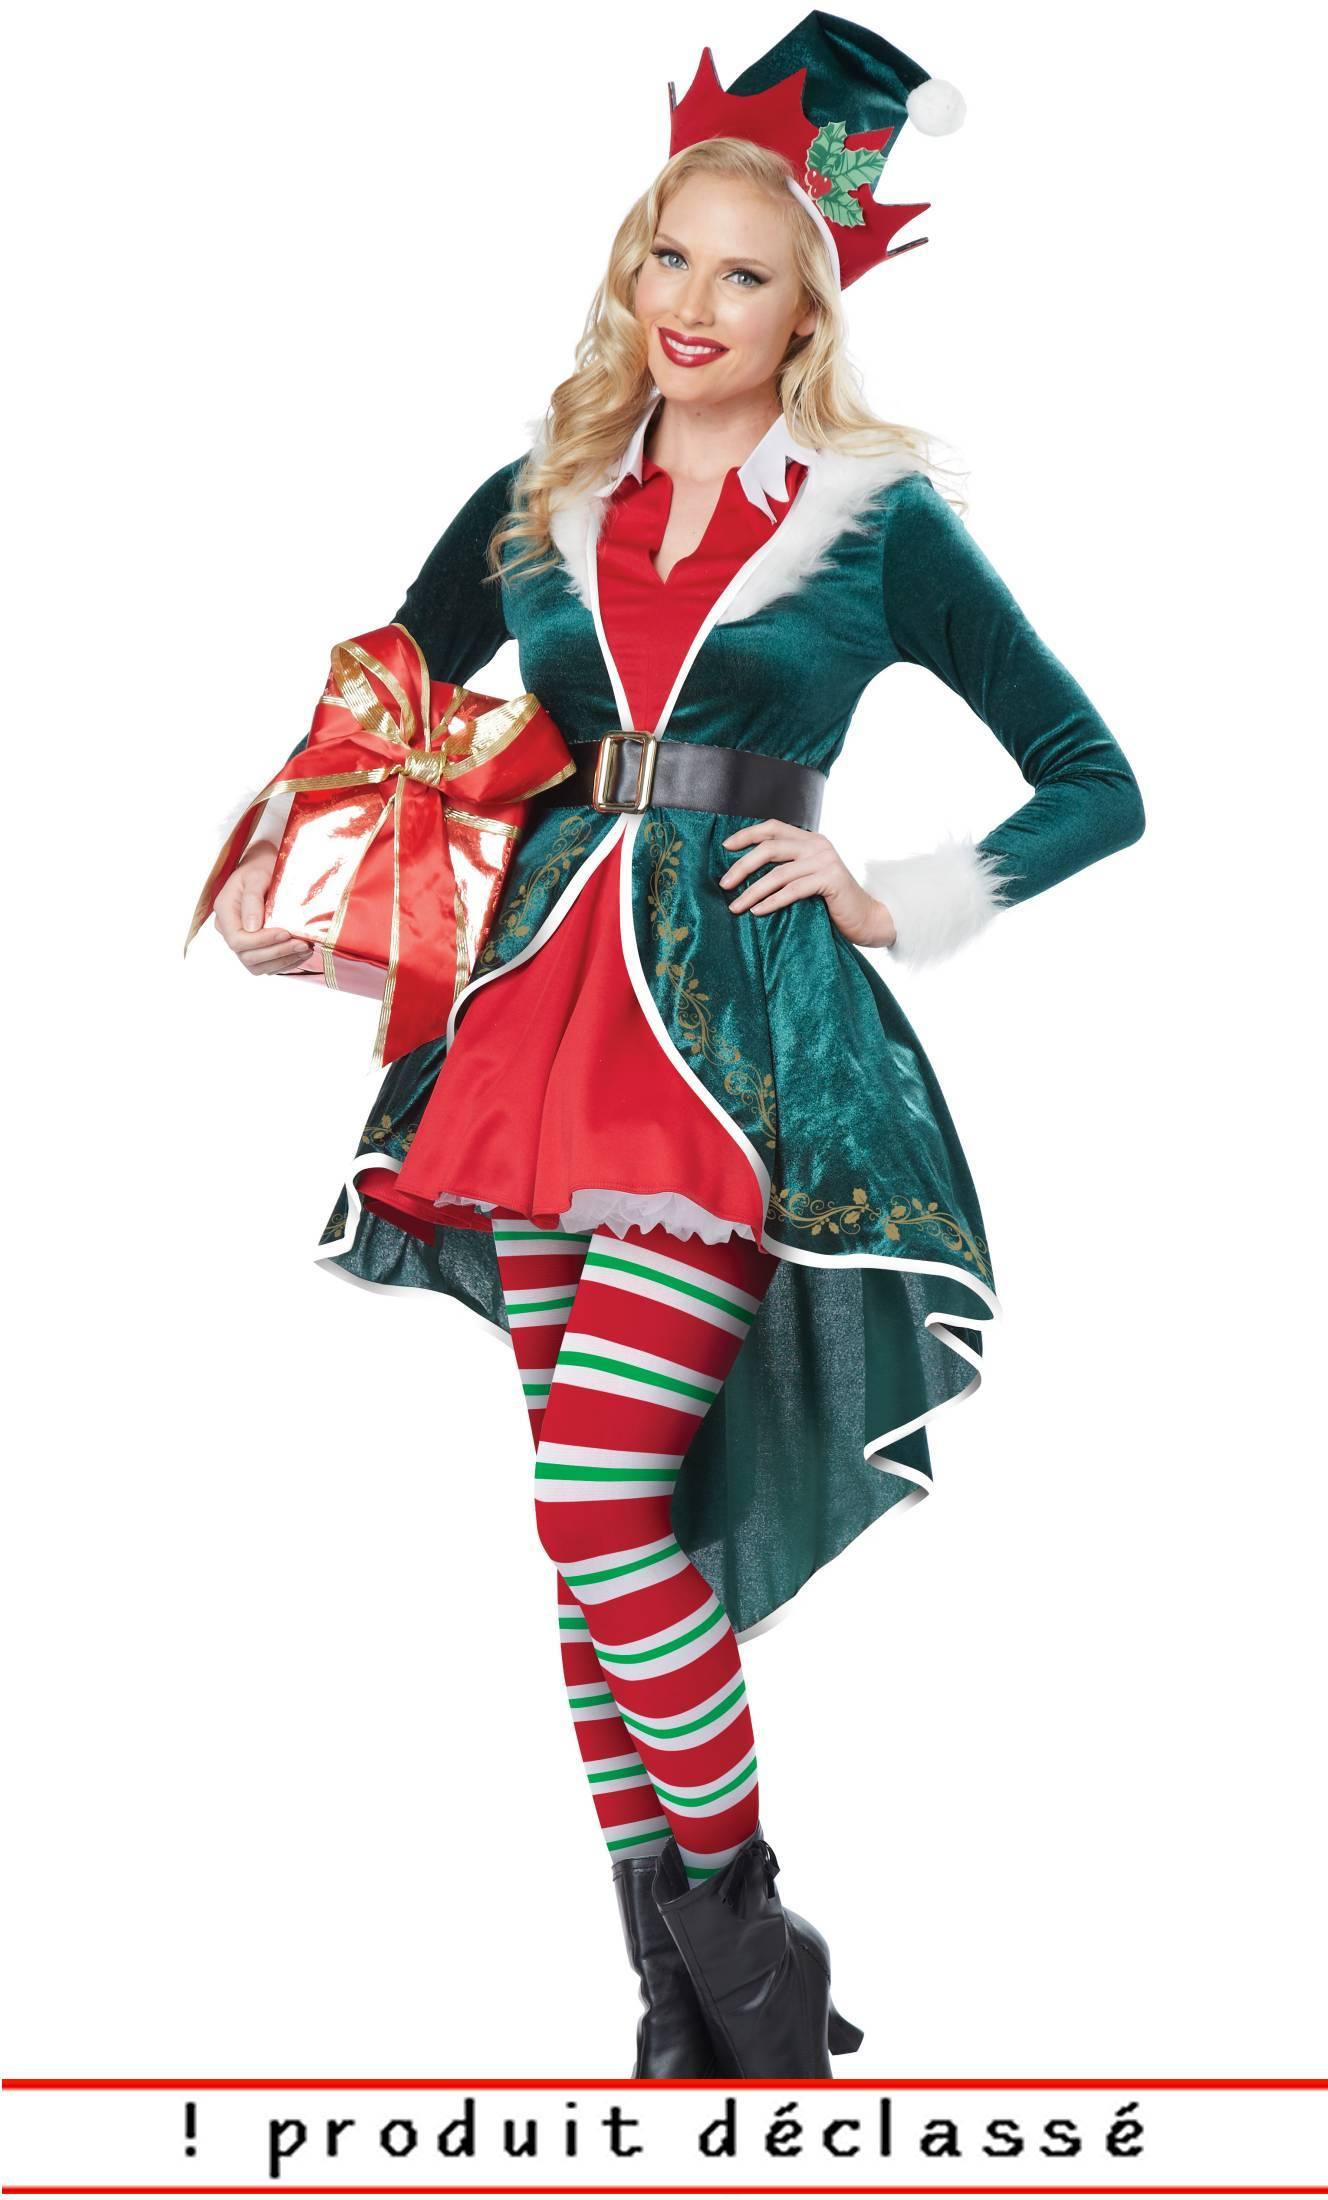 Lutin Noël Choix V21046 2 Costume Femme PZXiuTOk